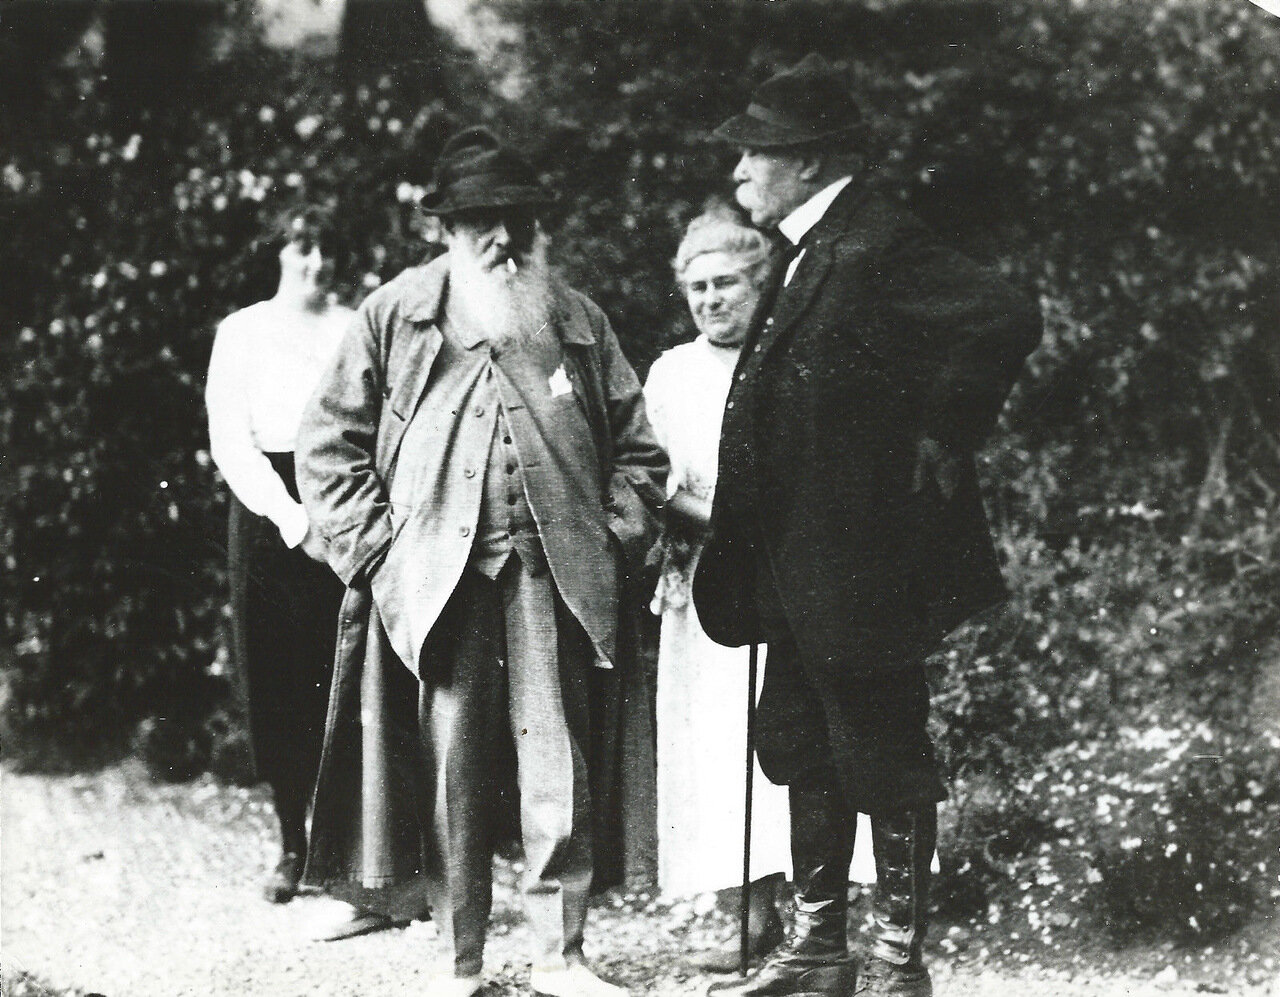 1921. ���� ���� (��������) � ���� �������� (������������ � ��������������� �������) � ���� ����� �������